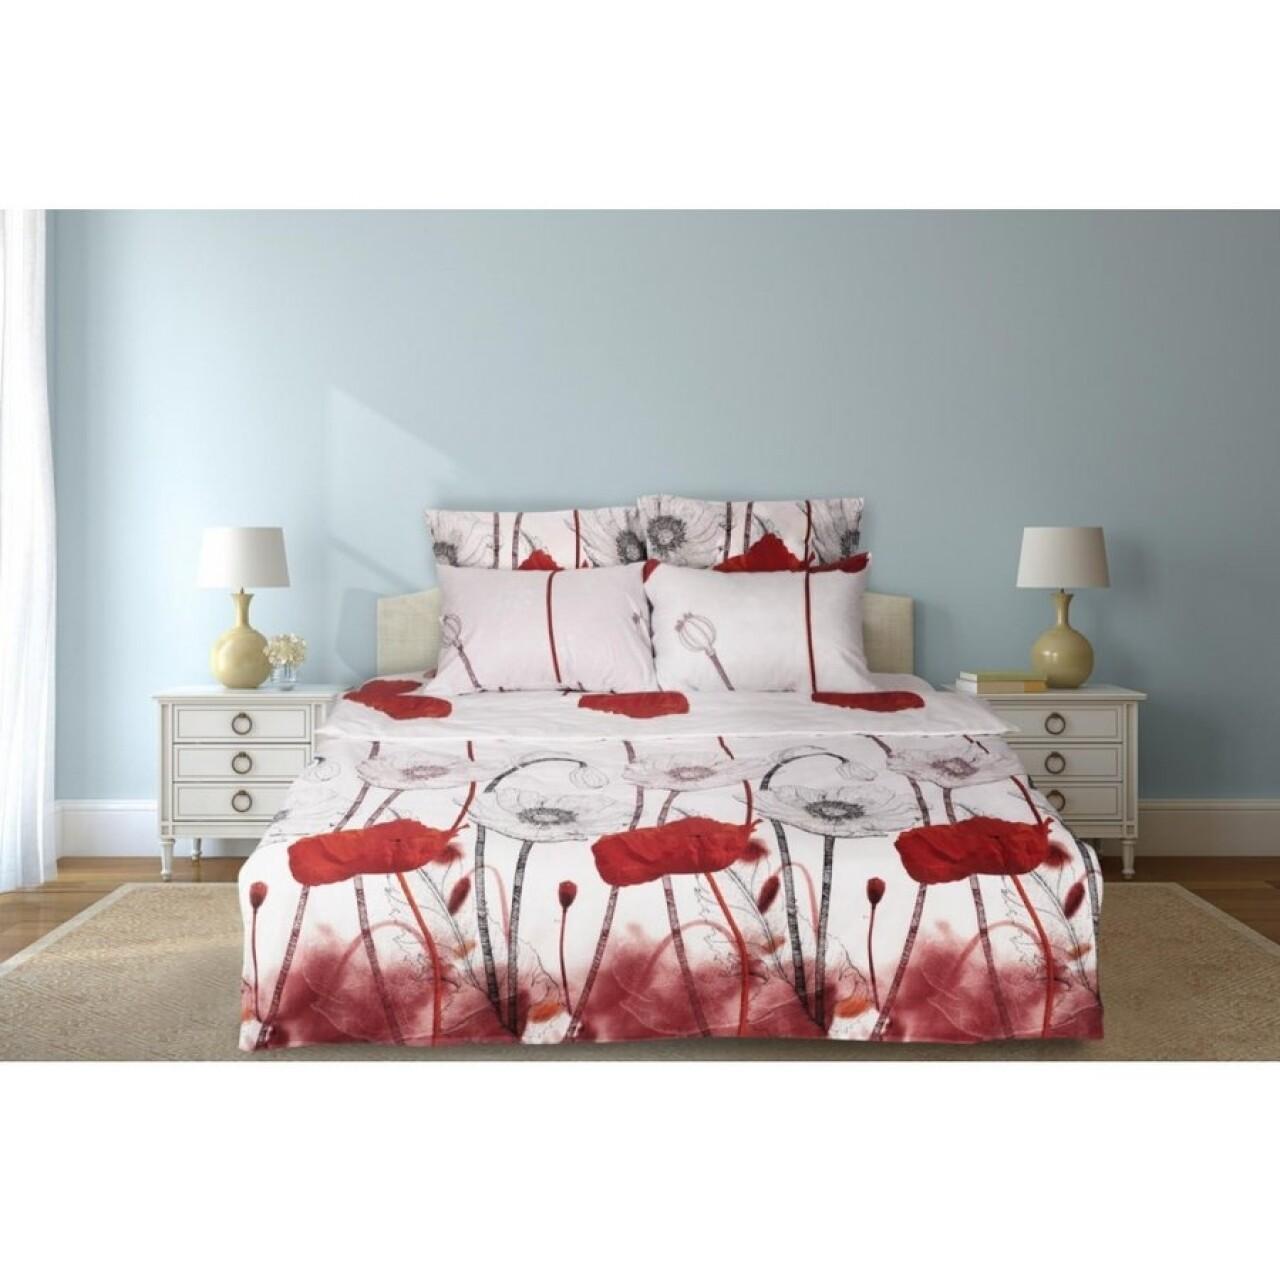 Lenjerie de pat dubla Maci, Heinner Home, 6 piese, 200x220 cm, 100% bumbac, rosu si alb